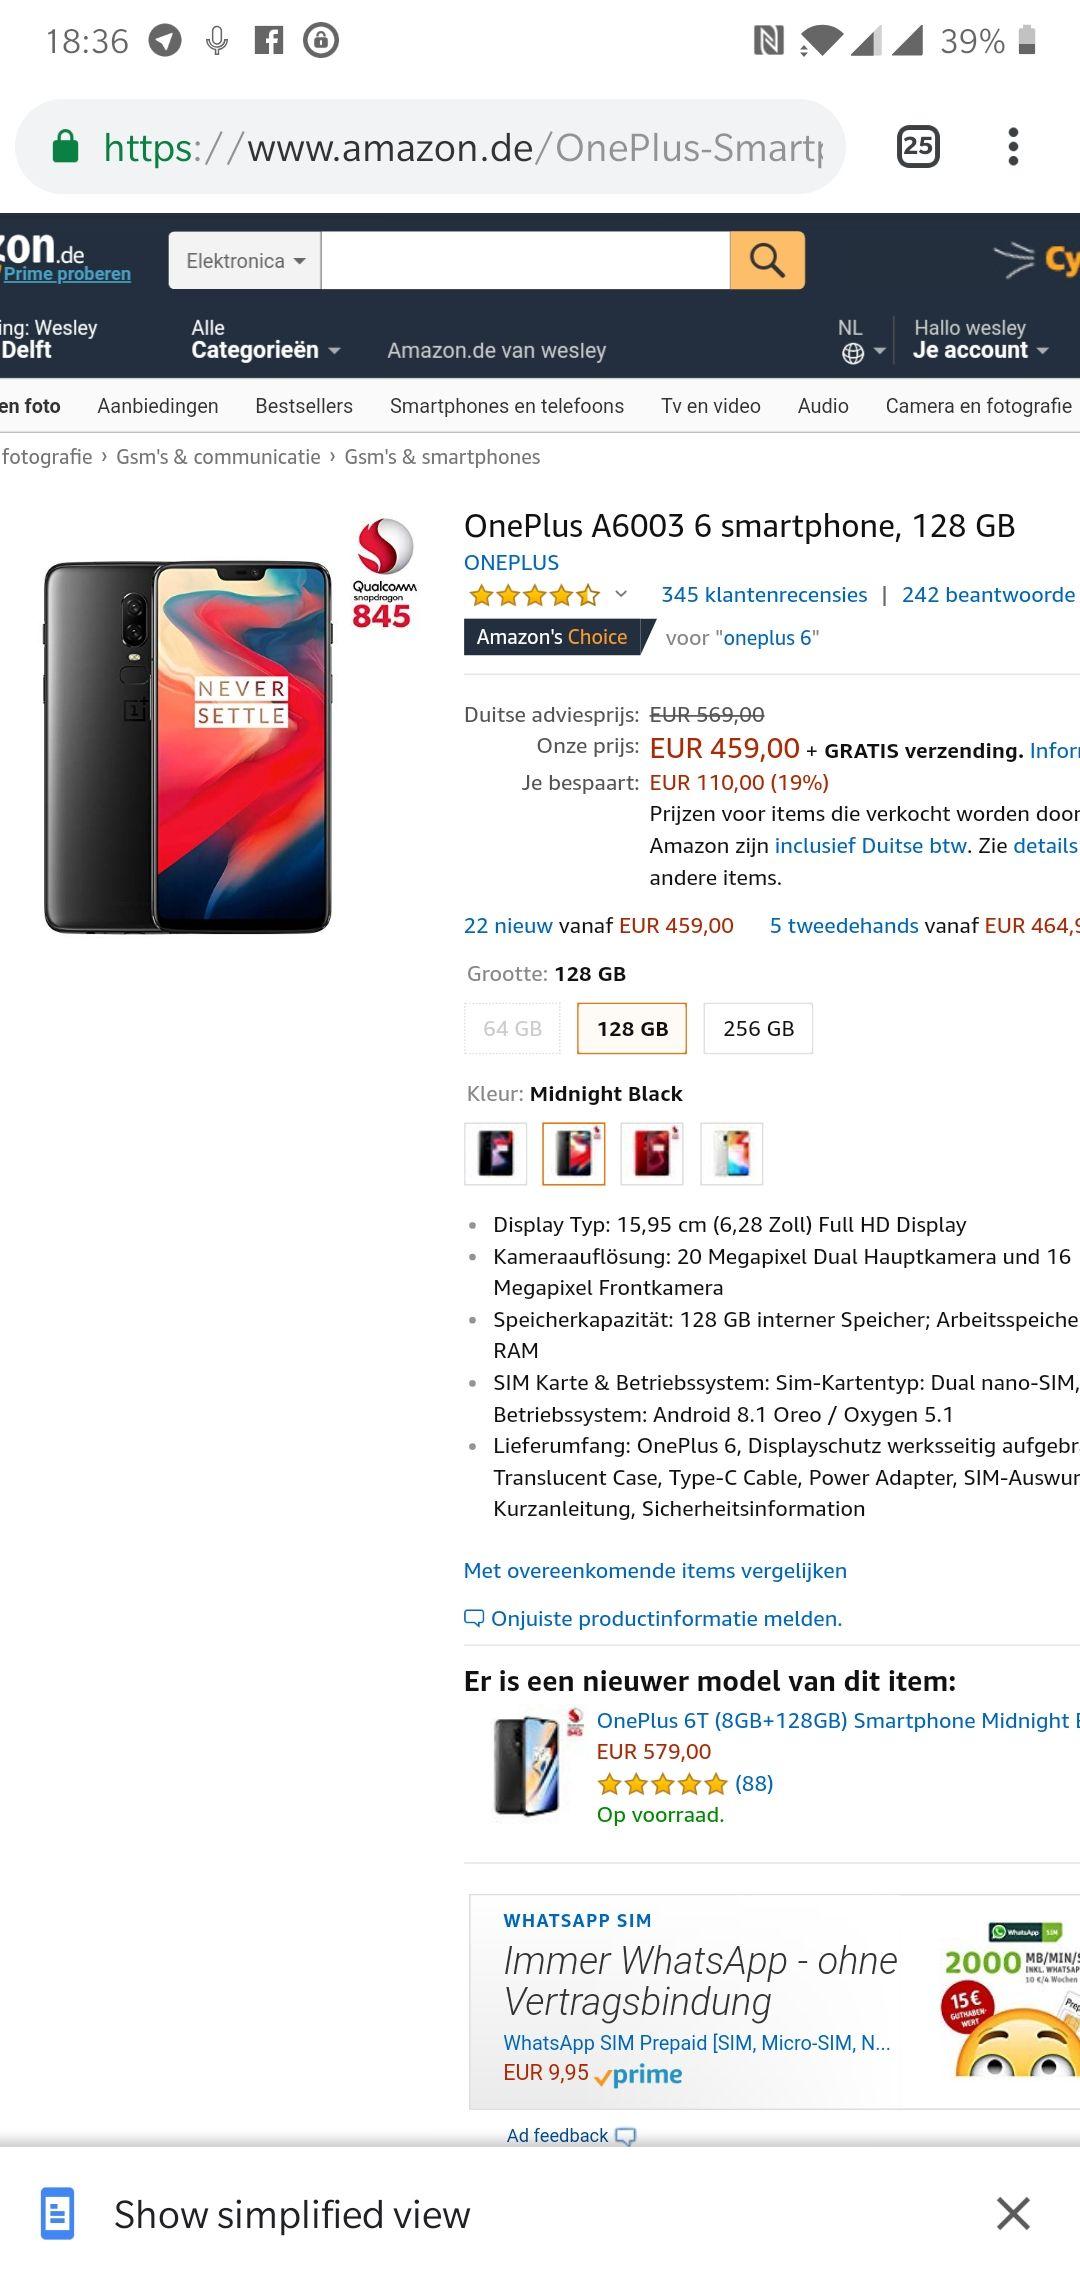 OnePlus 6 128GB 459 bij Amazon.de